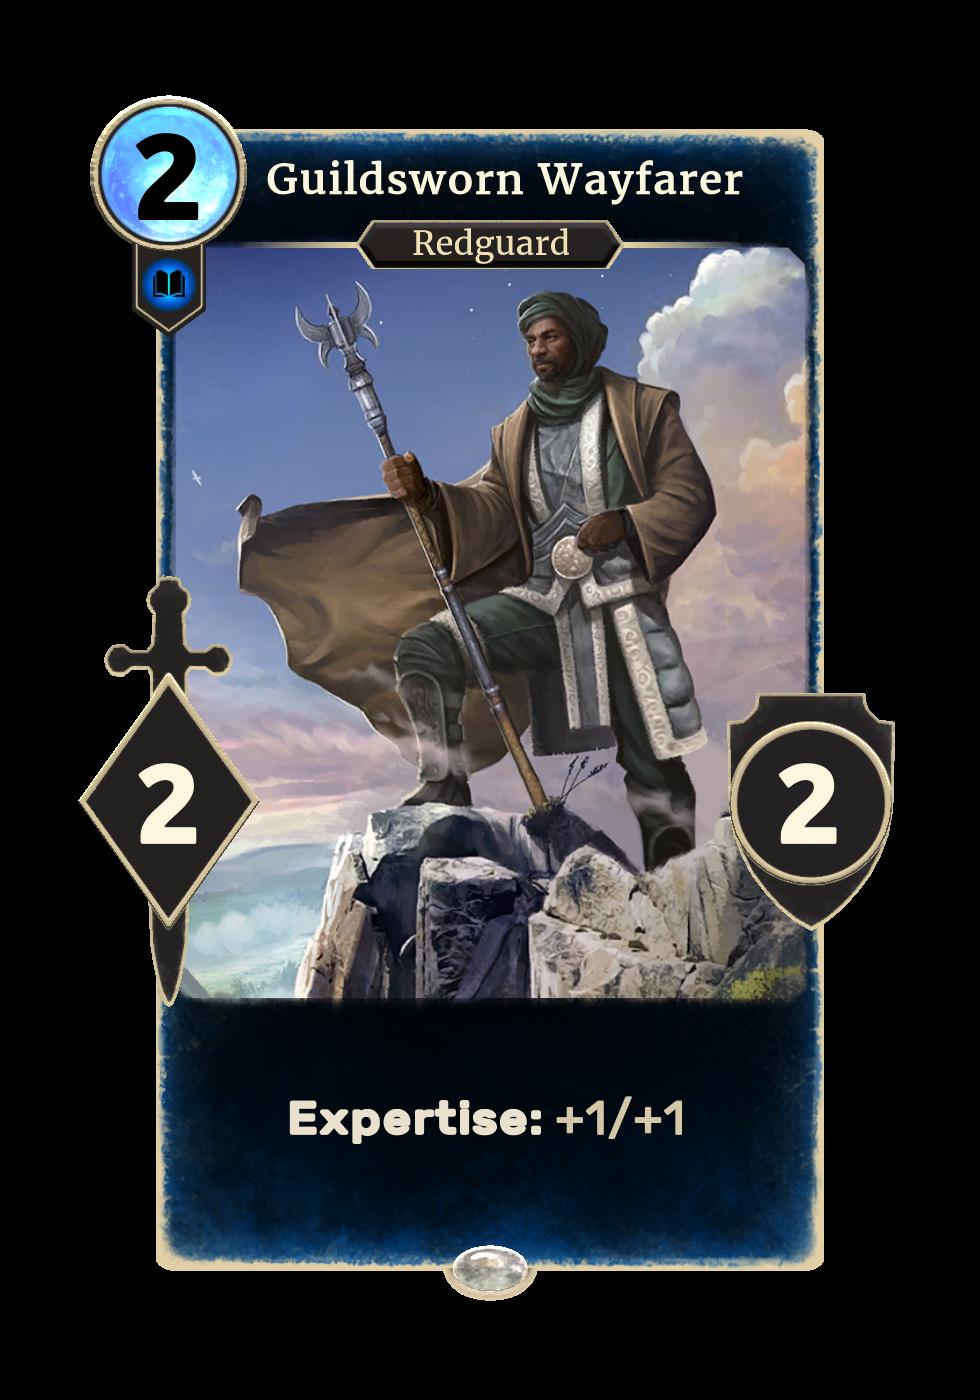 Guildsworn Wayfarer